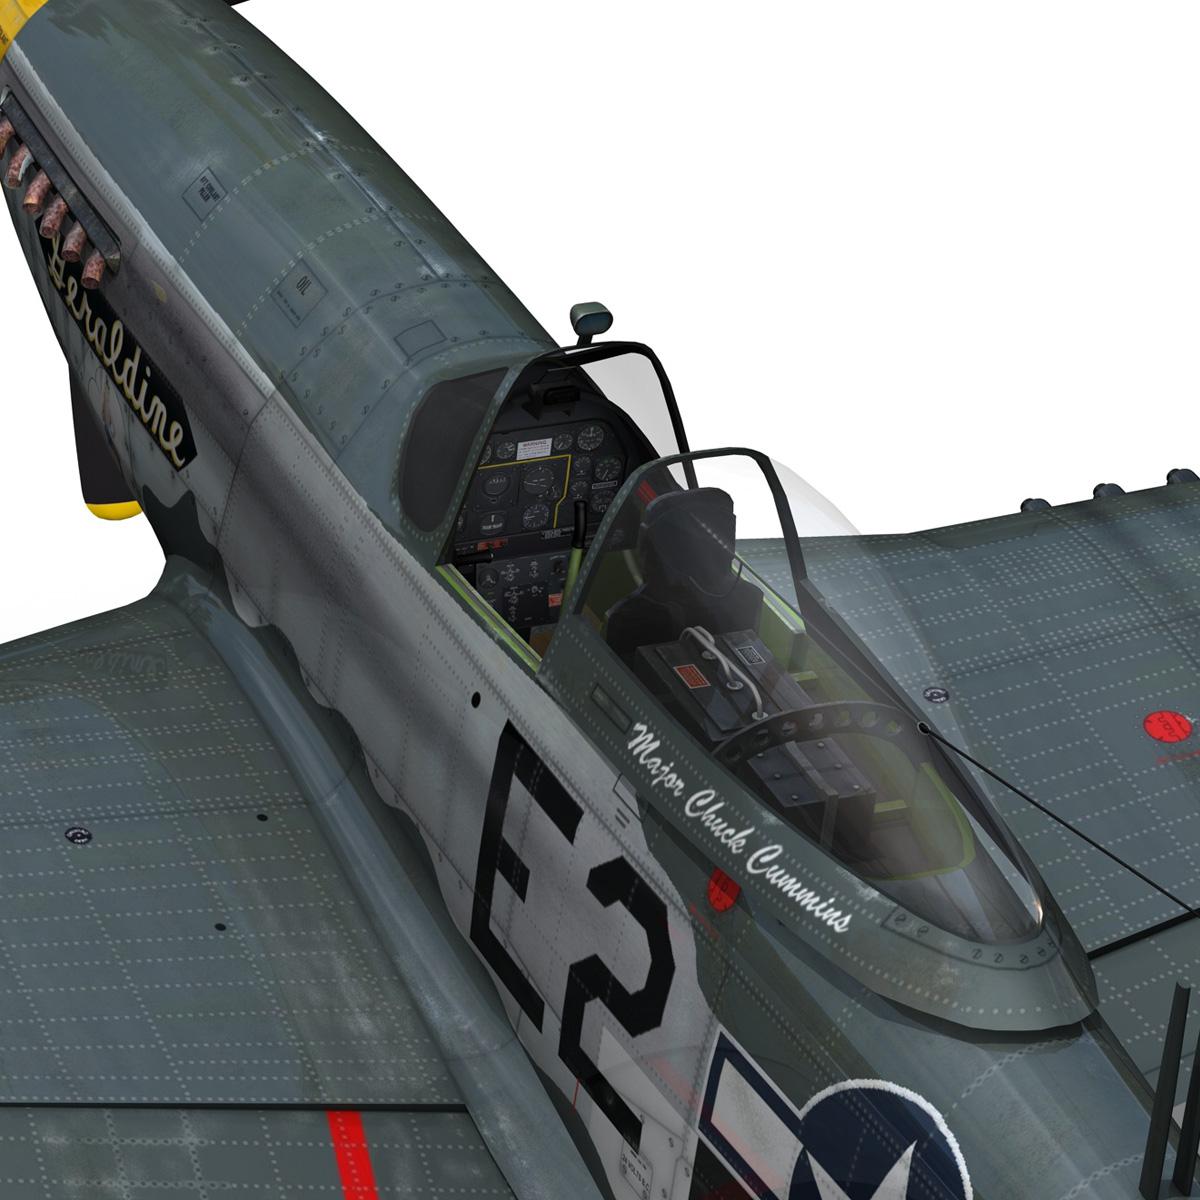 North American P-51D - Geraldine 3d model fbx c4d lwo obj 265951